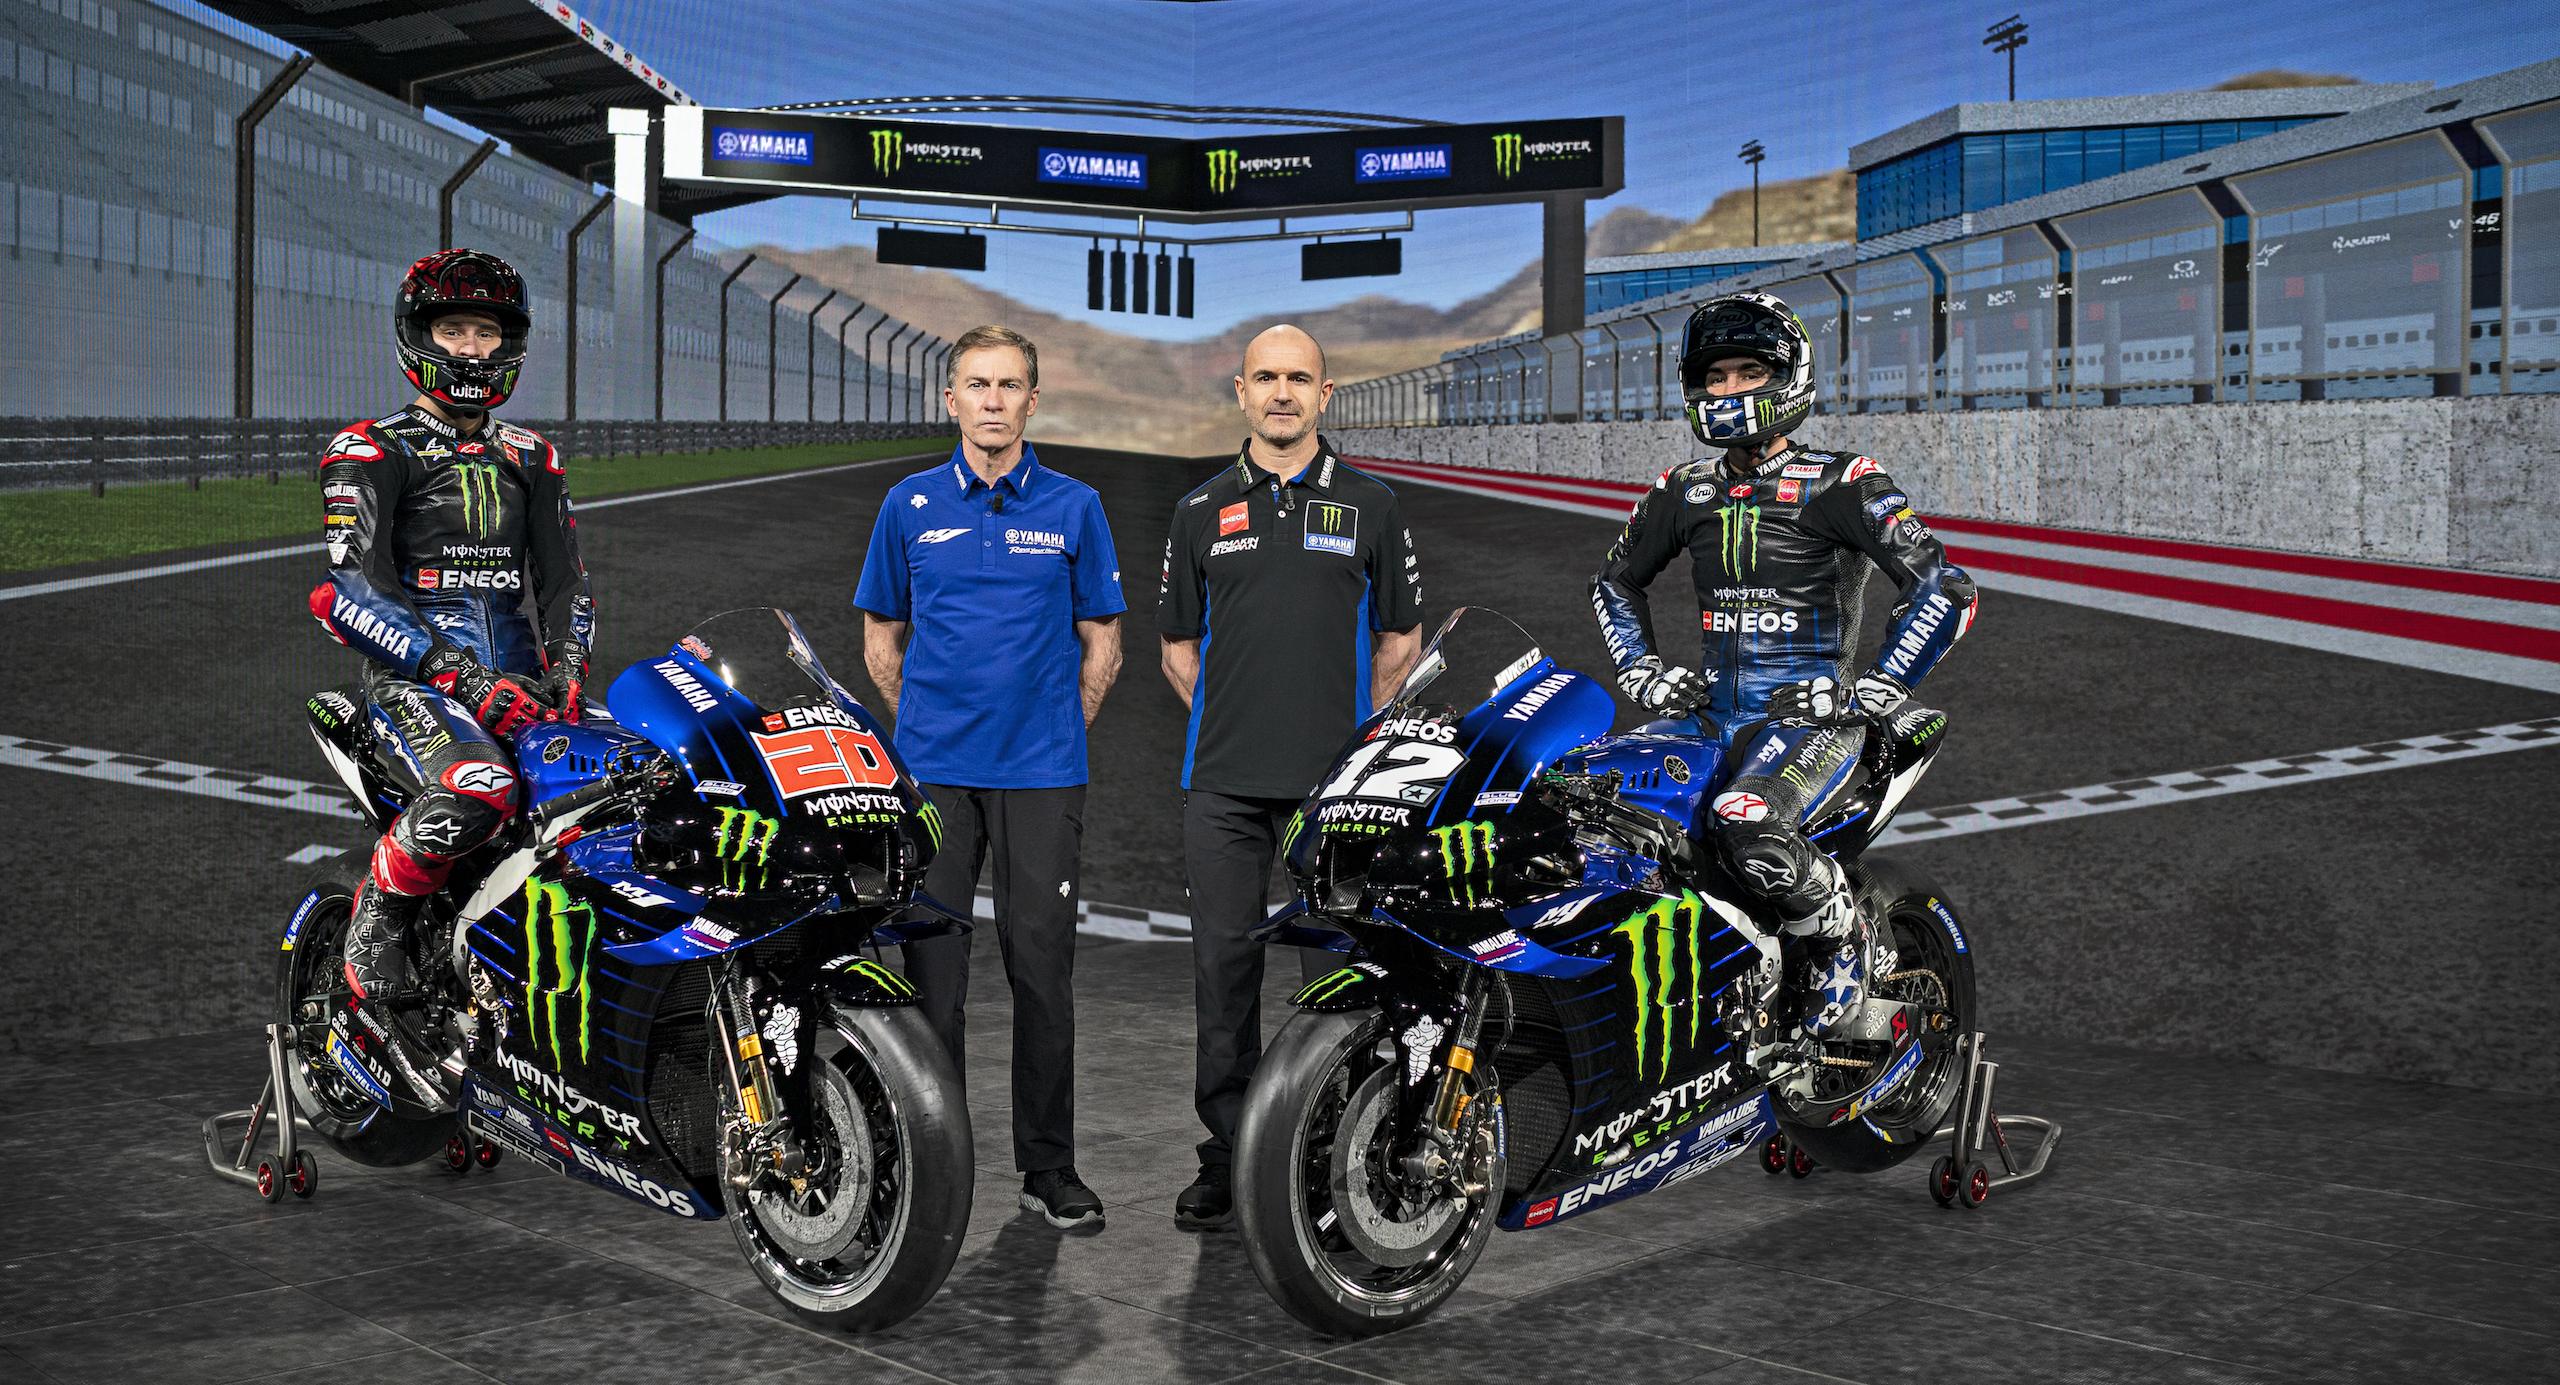 Monster Energy Yamaha w MotoGP: Quartararo, Jarvis, Meregalli, Vinales